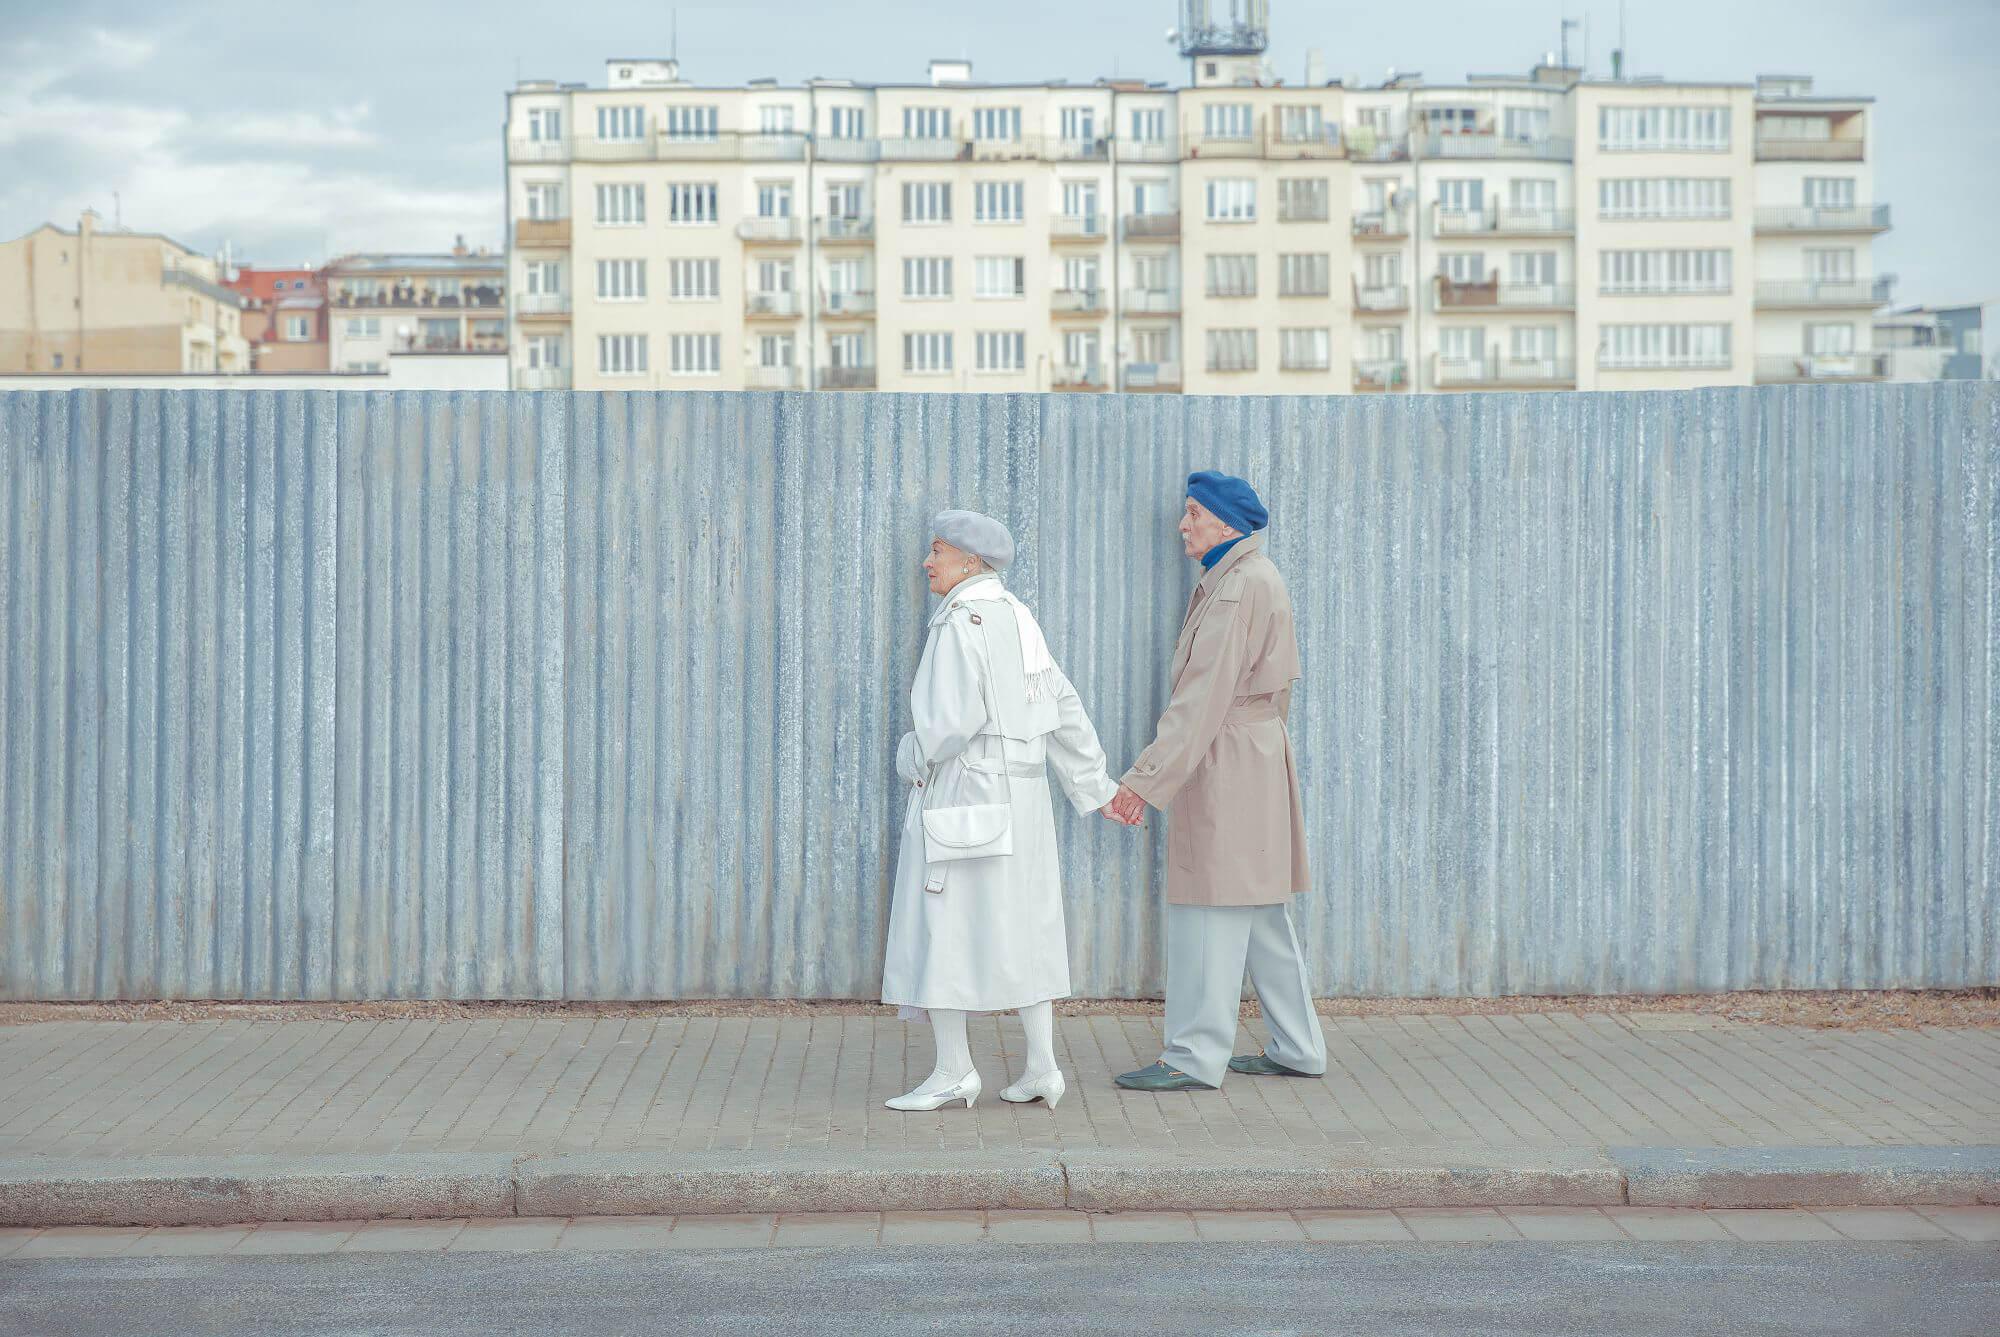 Мария Сварбова, Словакия / Maria Svarbova, Slovakia, Победитель категории «Искусство», Фотоконкурс Hasselblad Masters